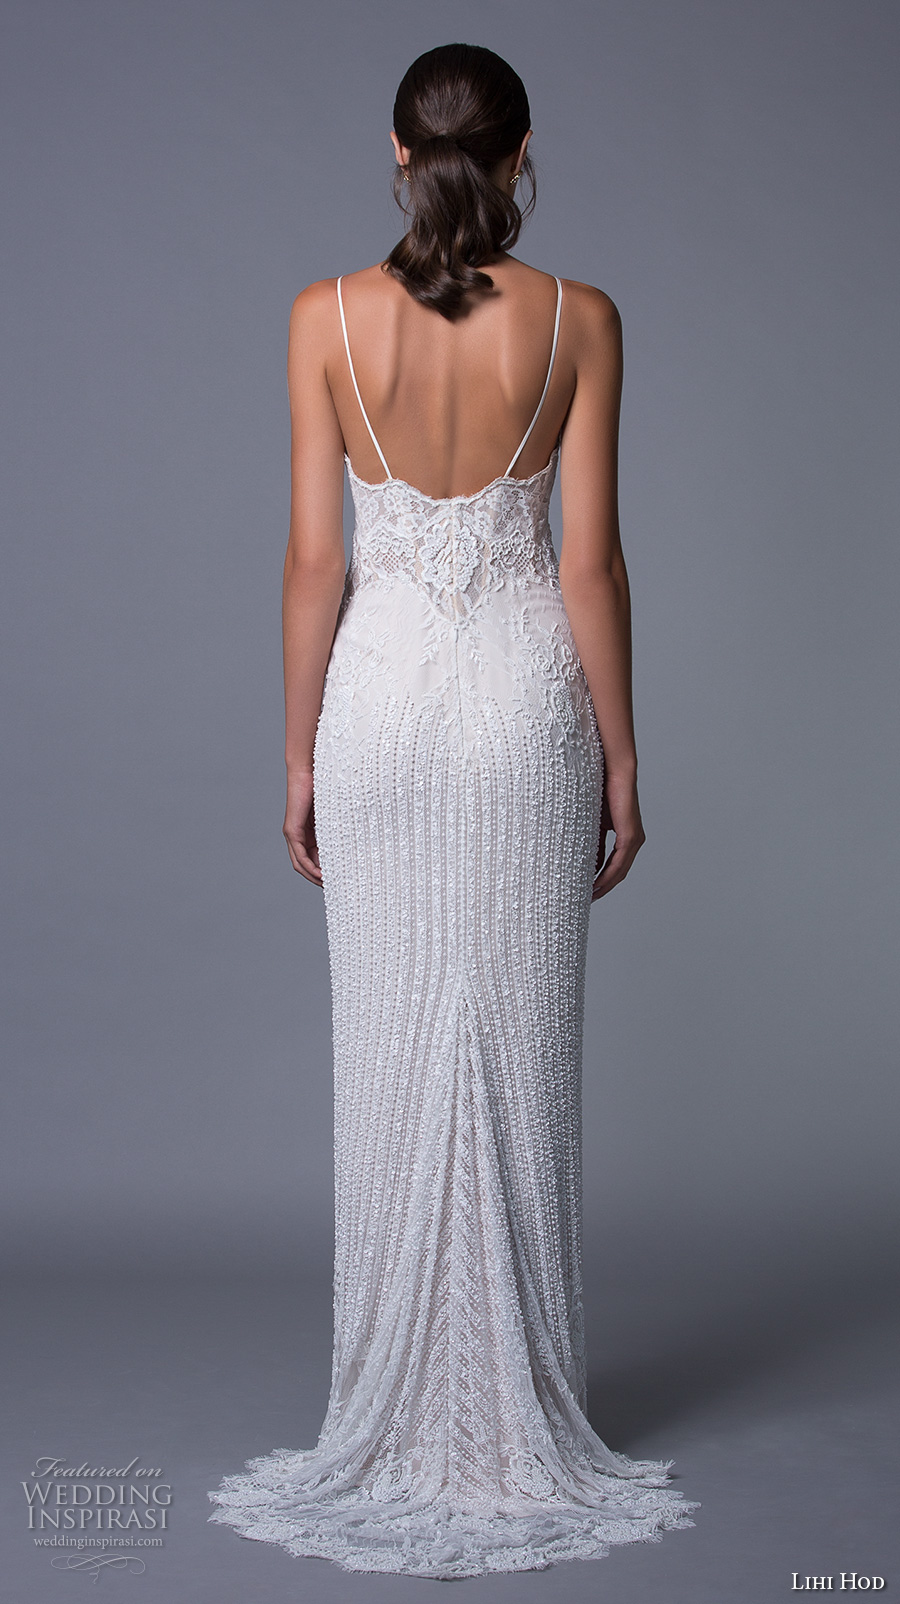 Milanoo Wedding Dresses 93 Cool lihi hod bridal spagetti